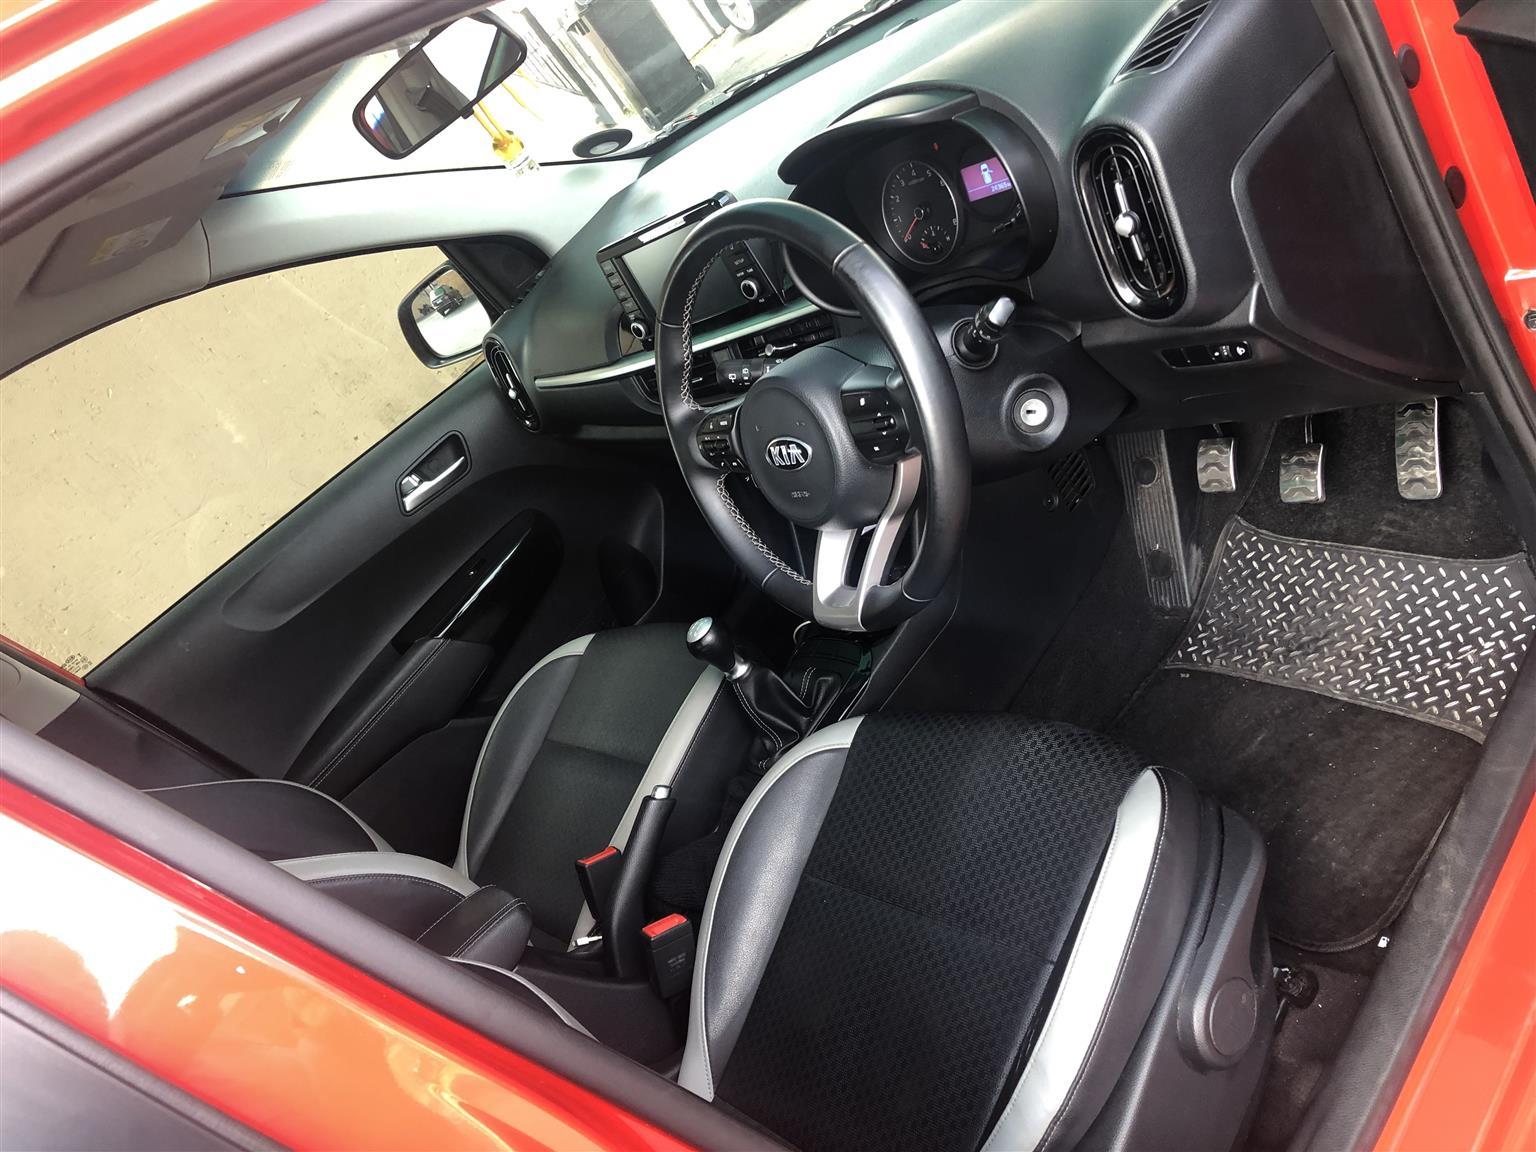 2017 Kia Picanto 1.0 Smart